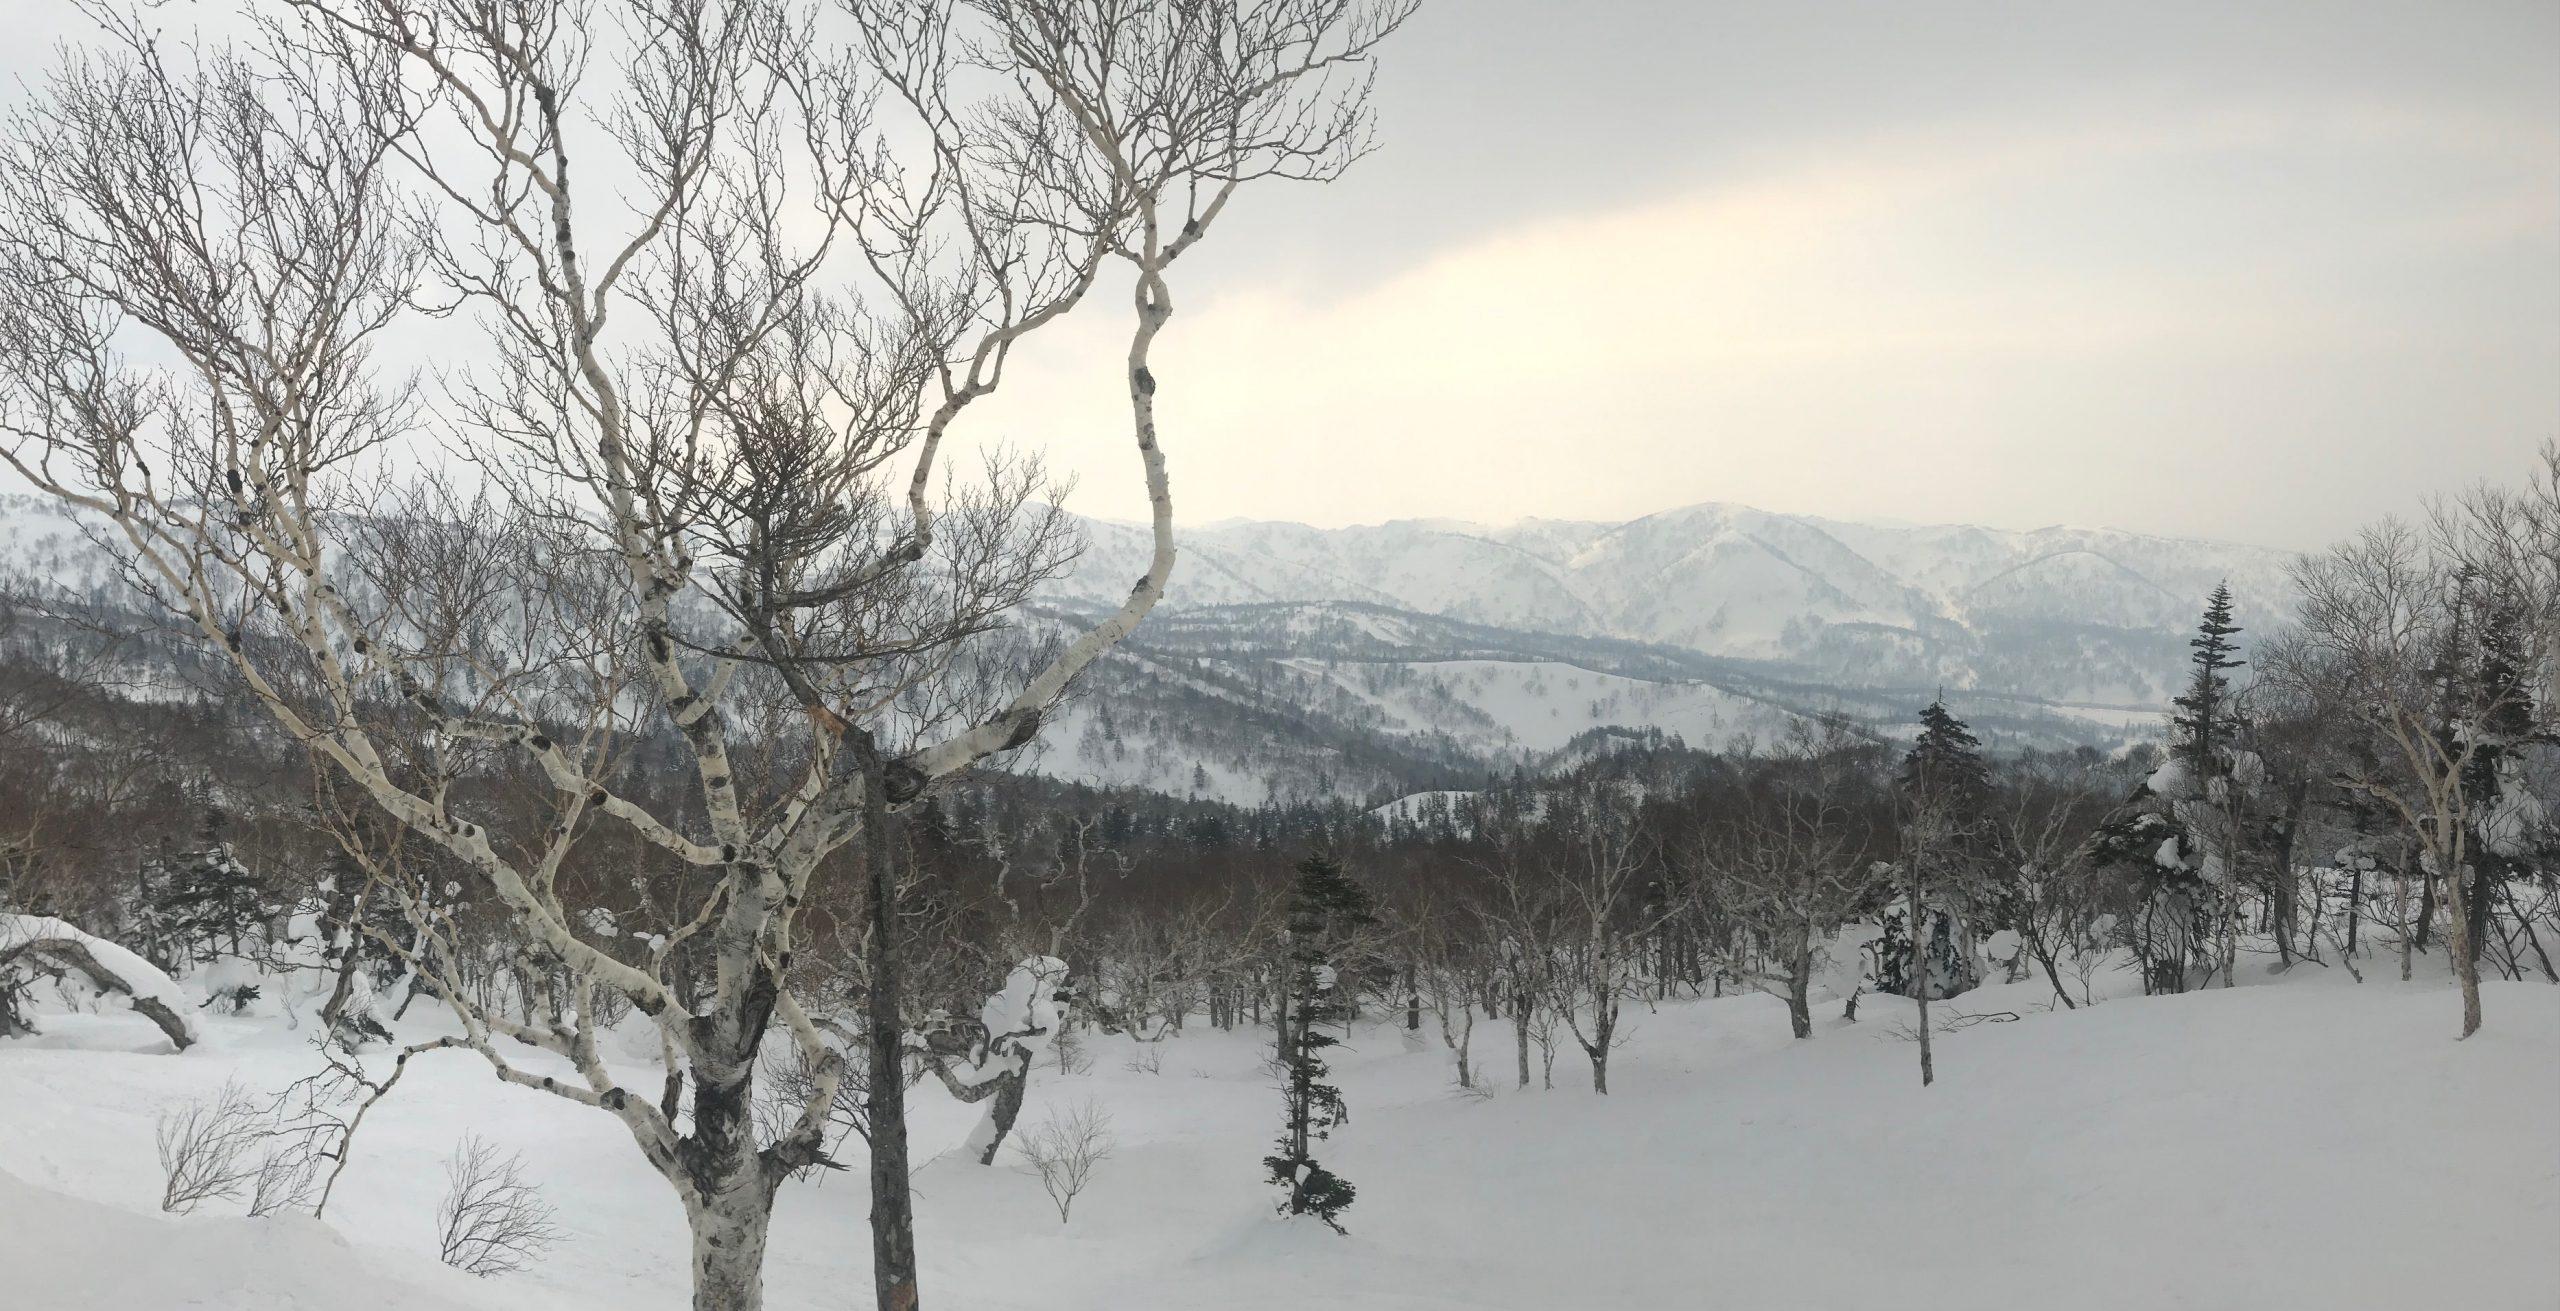 Kikiro Ski Resort